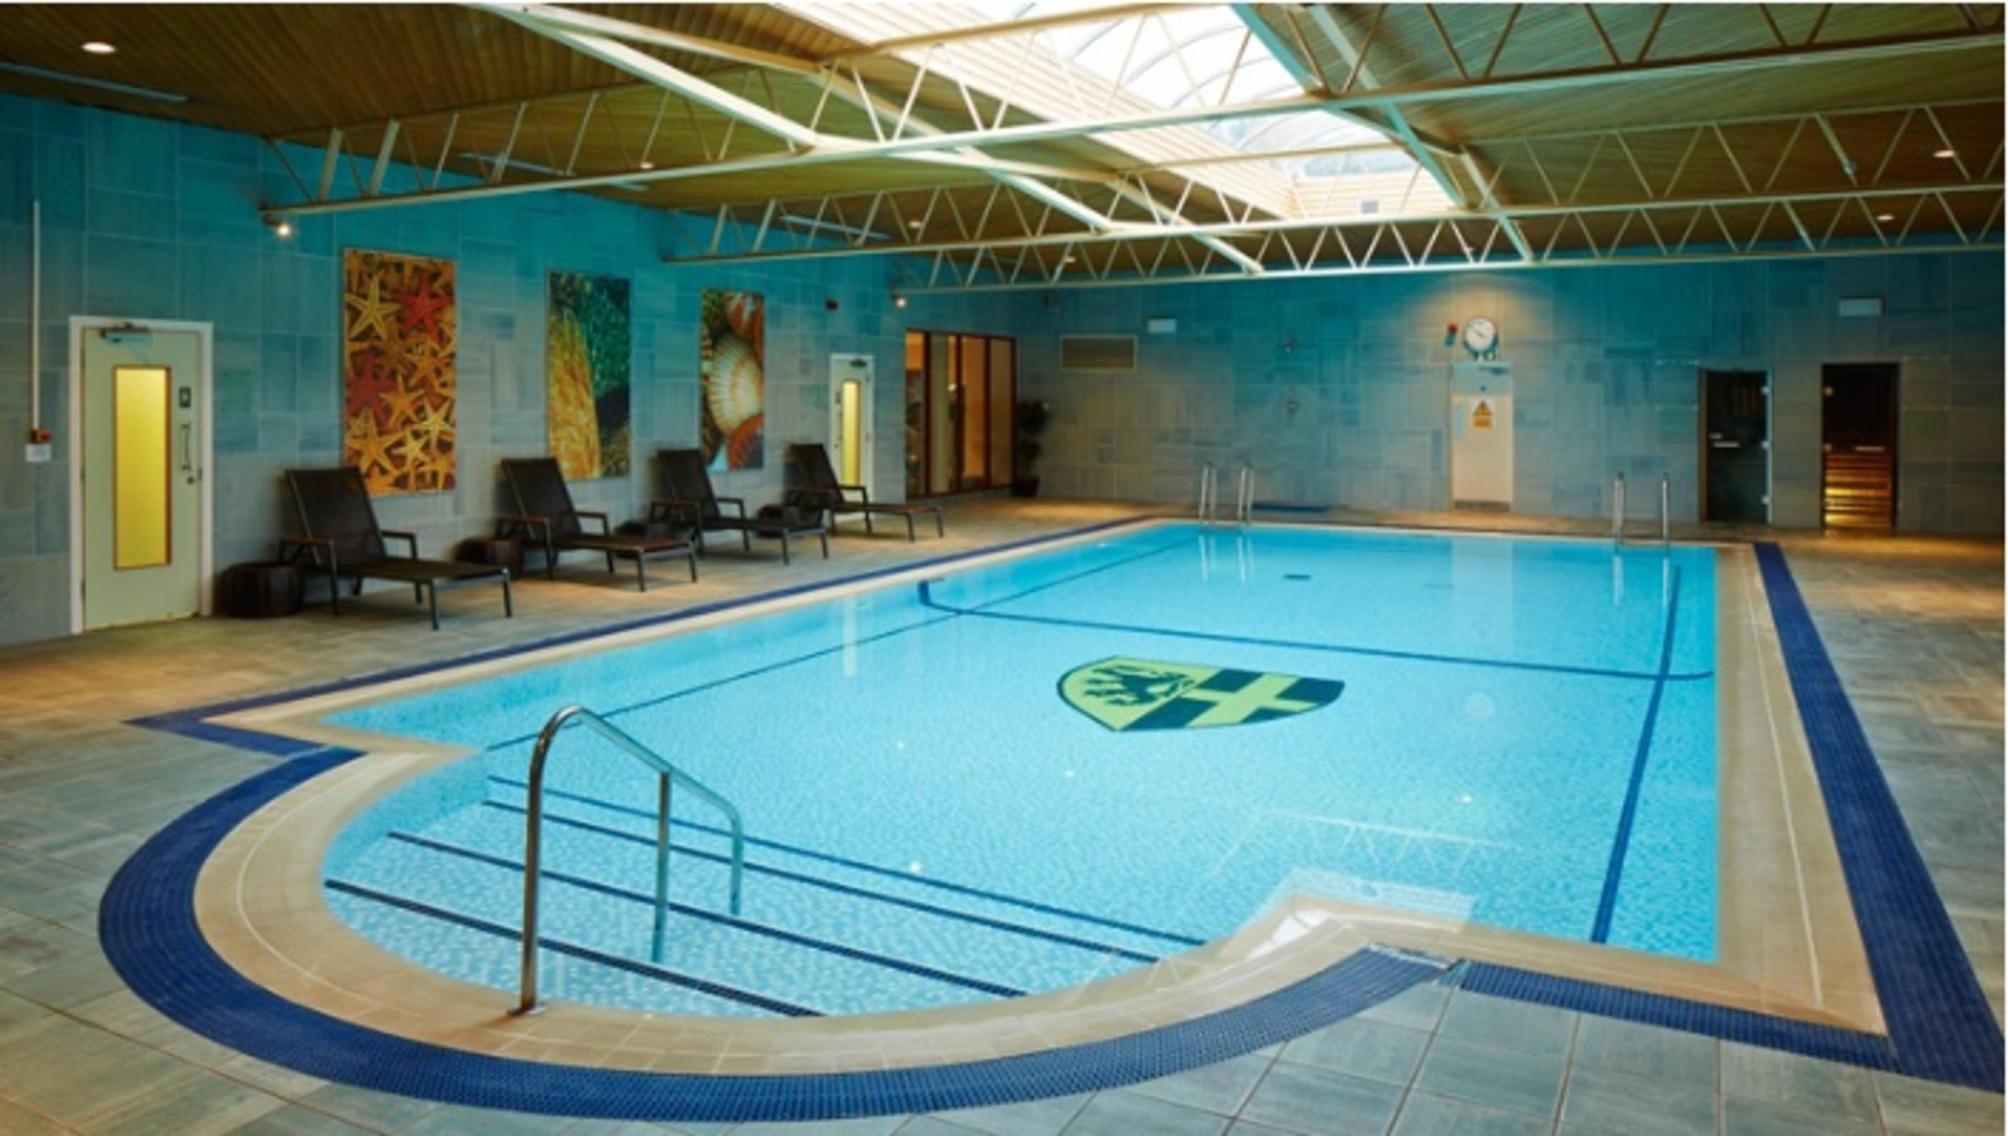 Hotel Billesley Manor Hotel En Stratford Upon Avon Desde 95 Rumbo